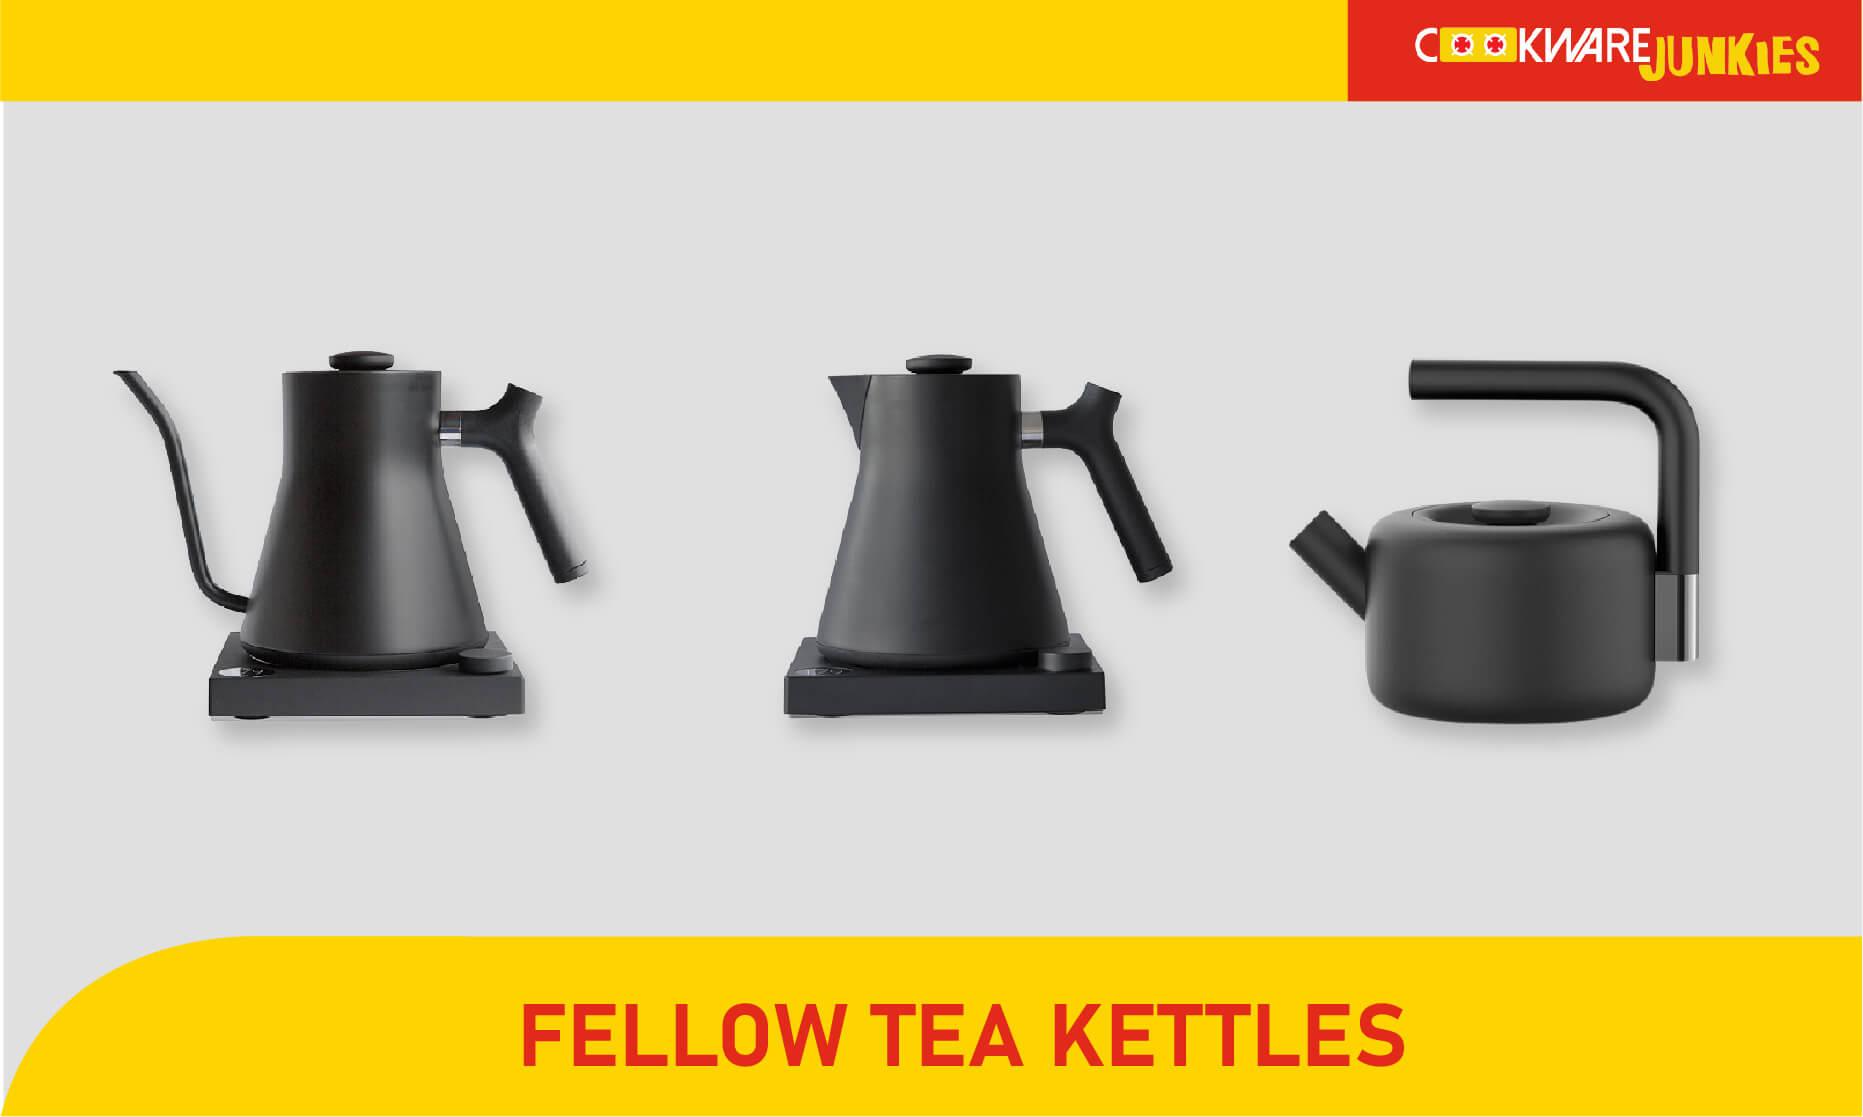 Fellow Tea Kettles Featured image